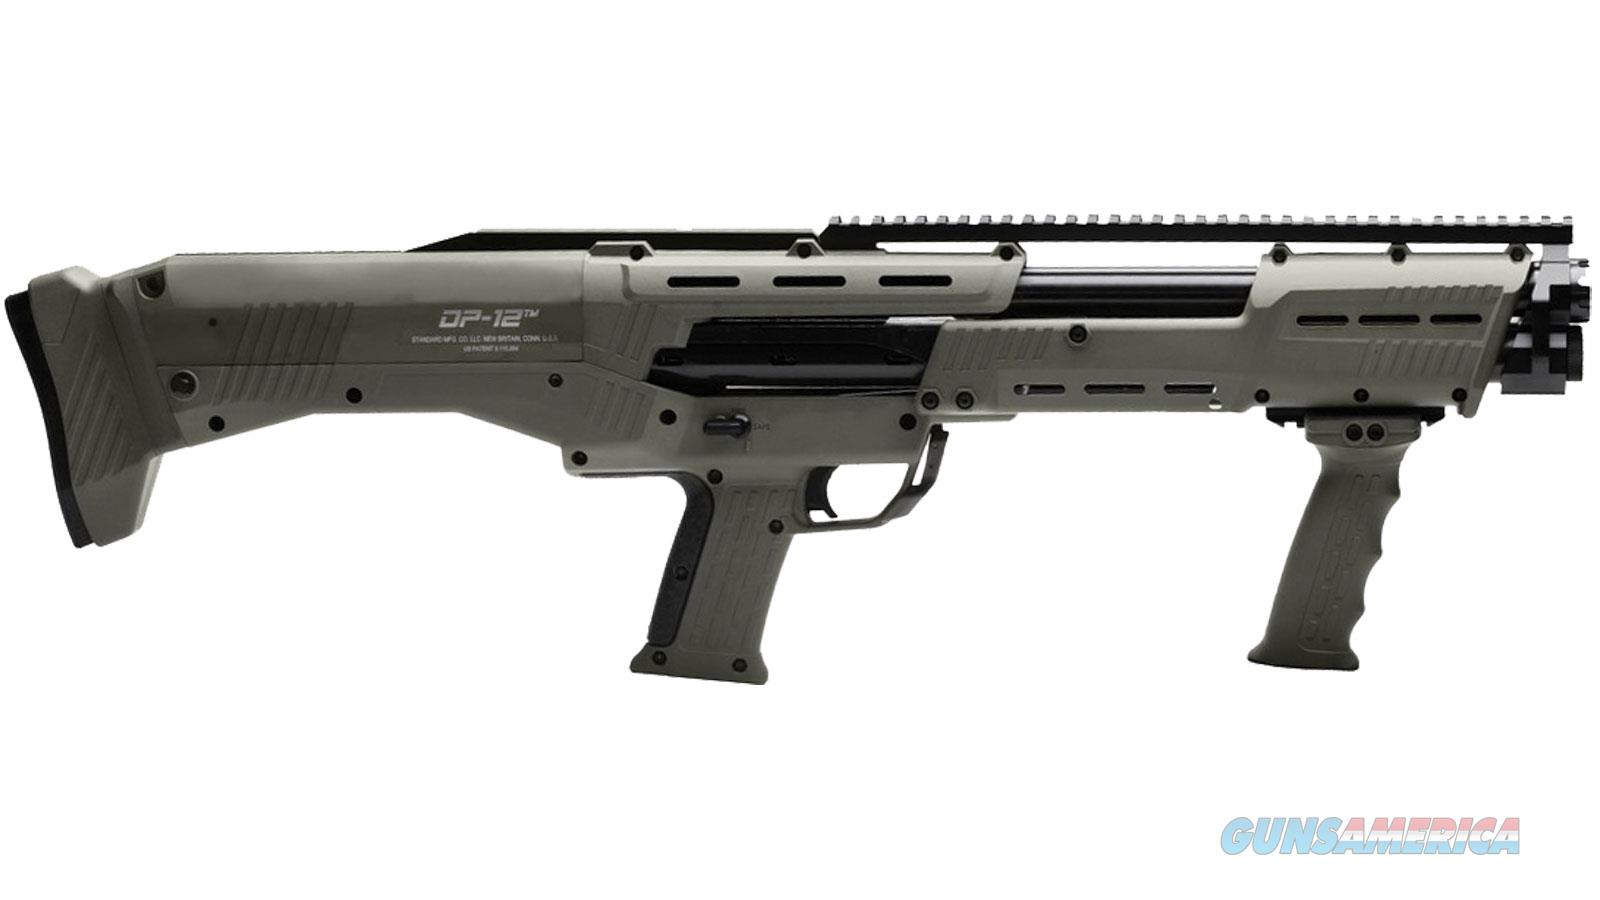 Standard Mfg DP-12 w/OD Green Finish  Guns > Shotguns > Military Misc. Shotguns US